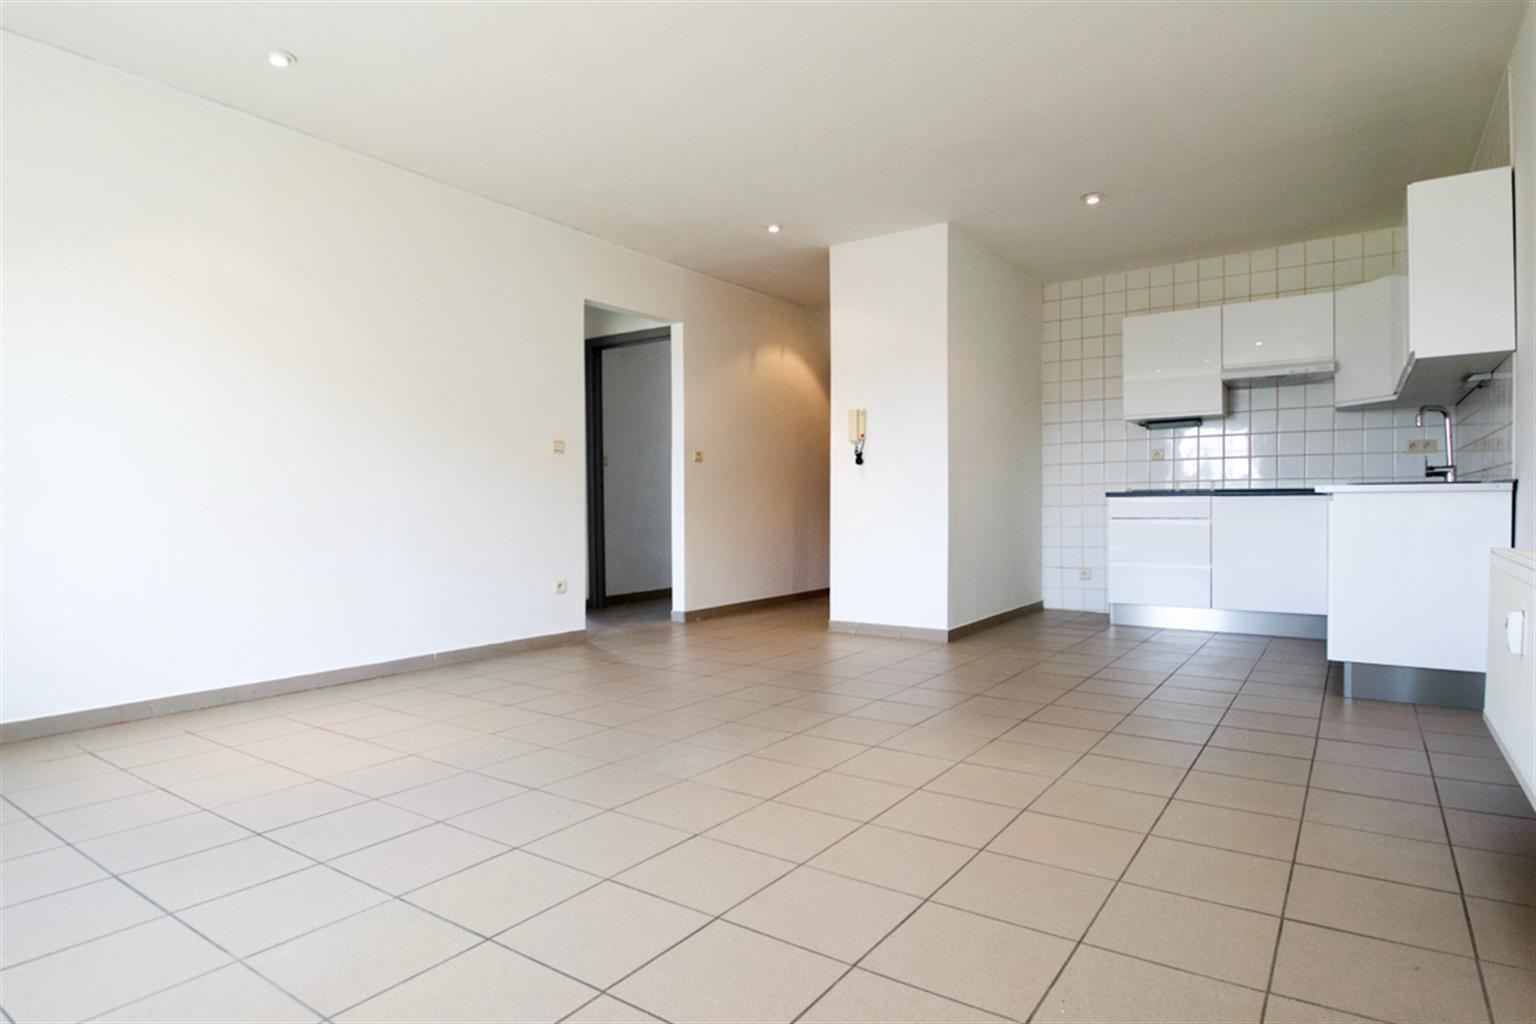 Appartement - Leval-Trahegnies - #3988340-1